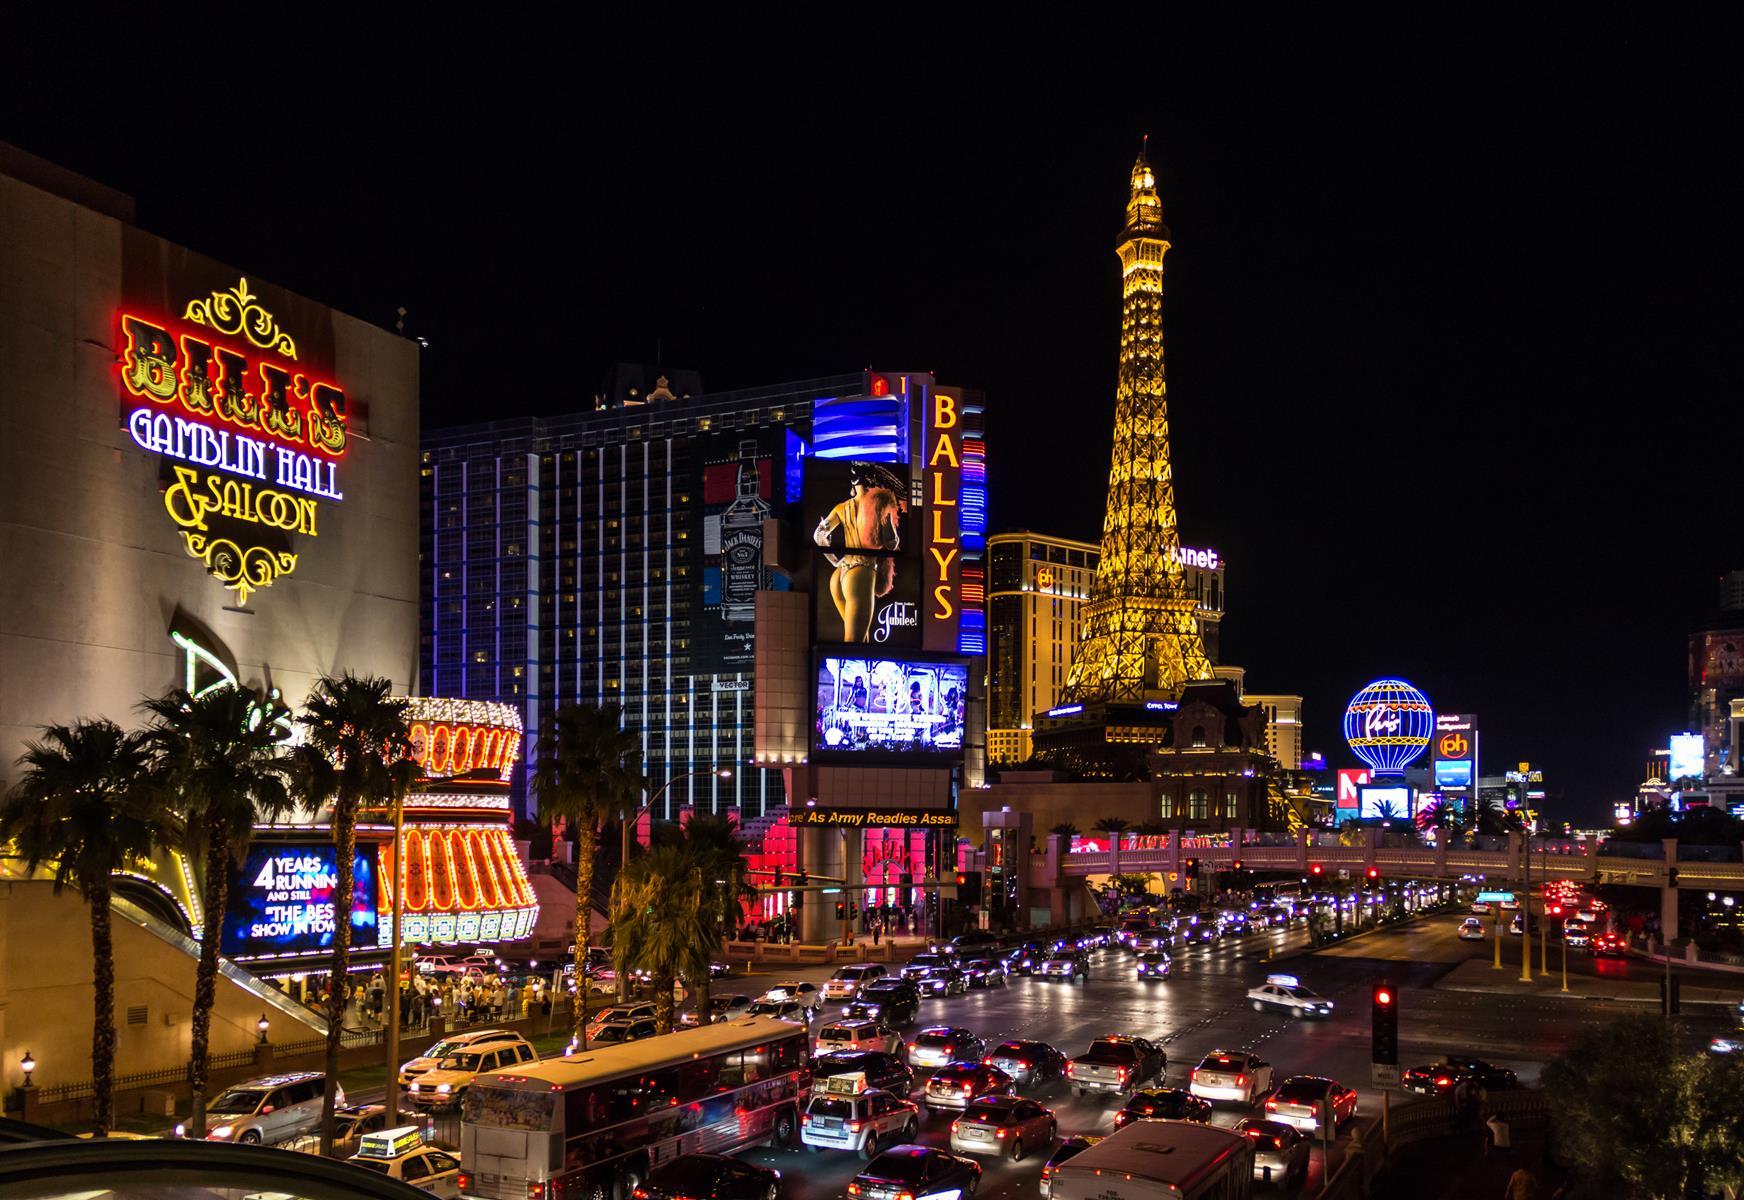 Las Vegas Personals Free Online Personals in Las Vegas NV